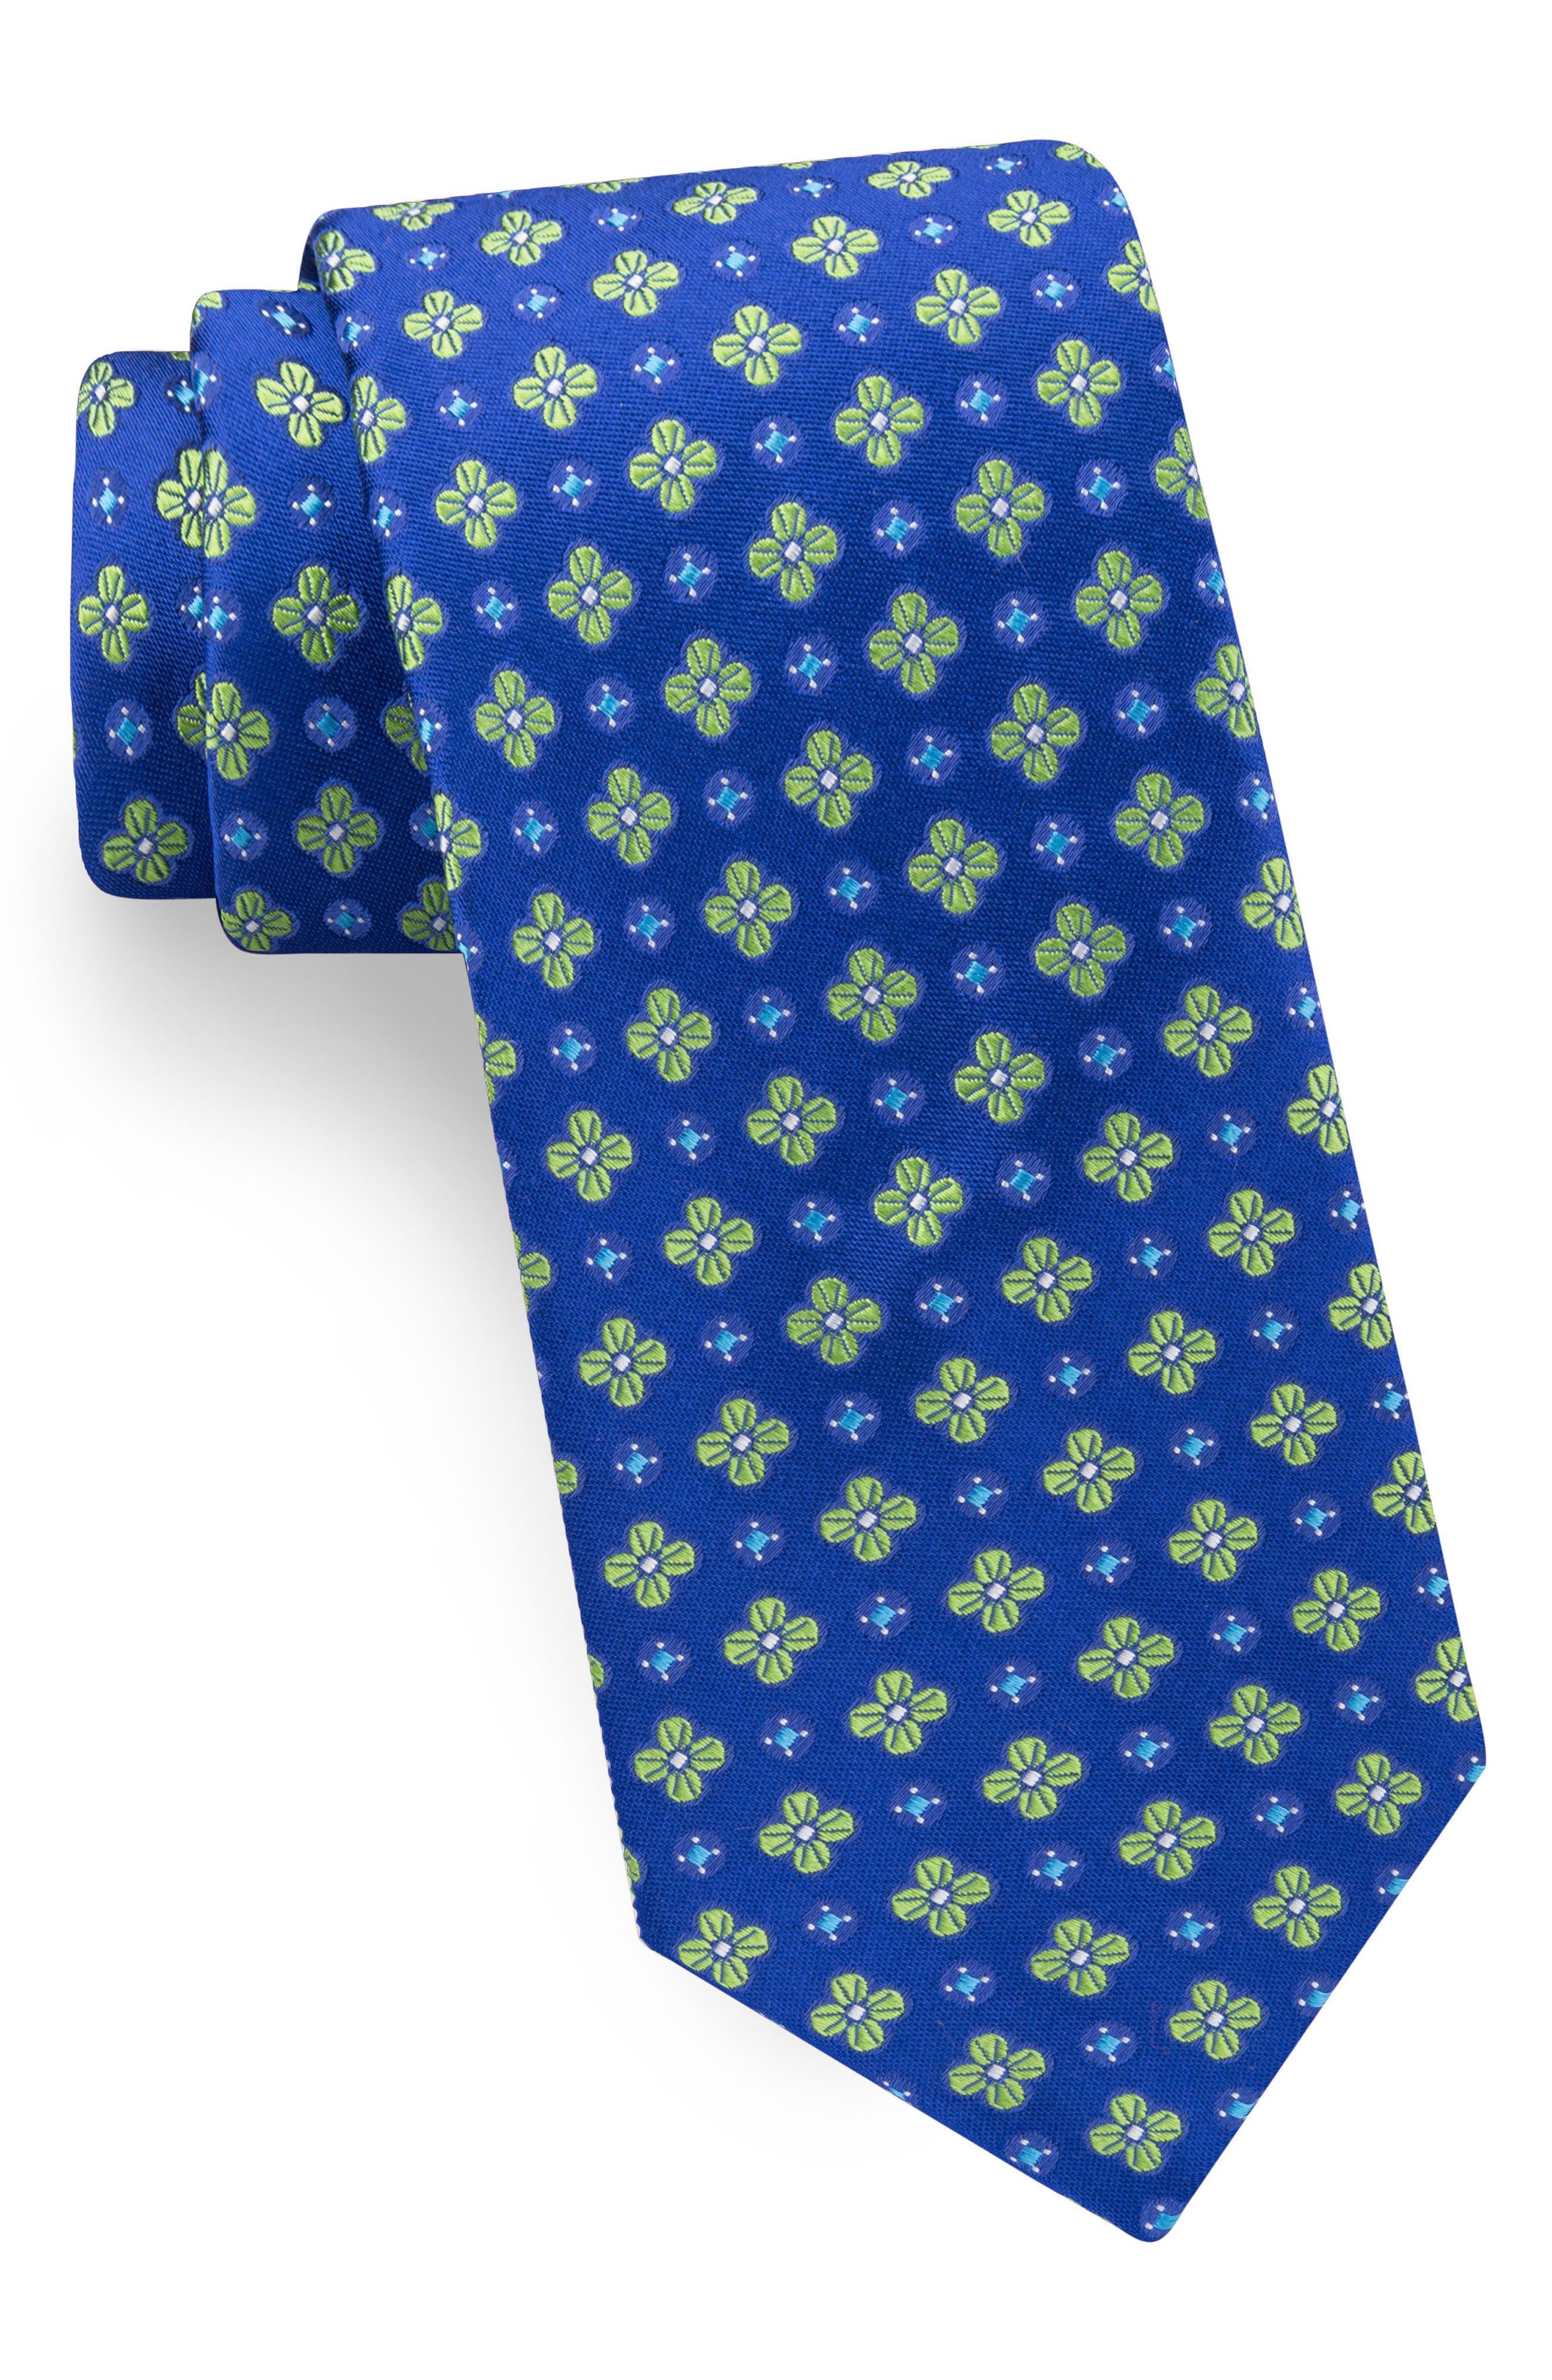 Lansbury Floral Silk Tie,                             Main thumbnail 1, color,                             475